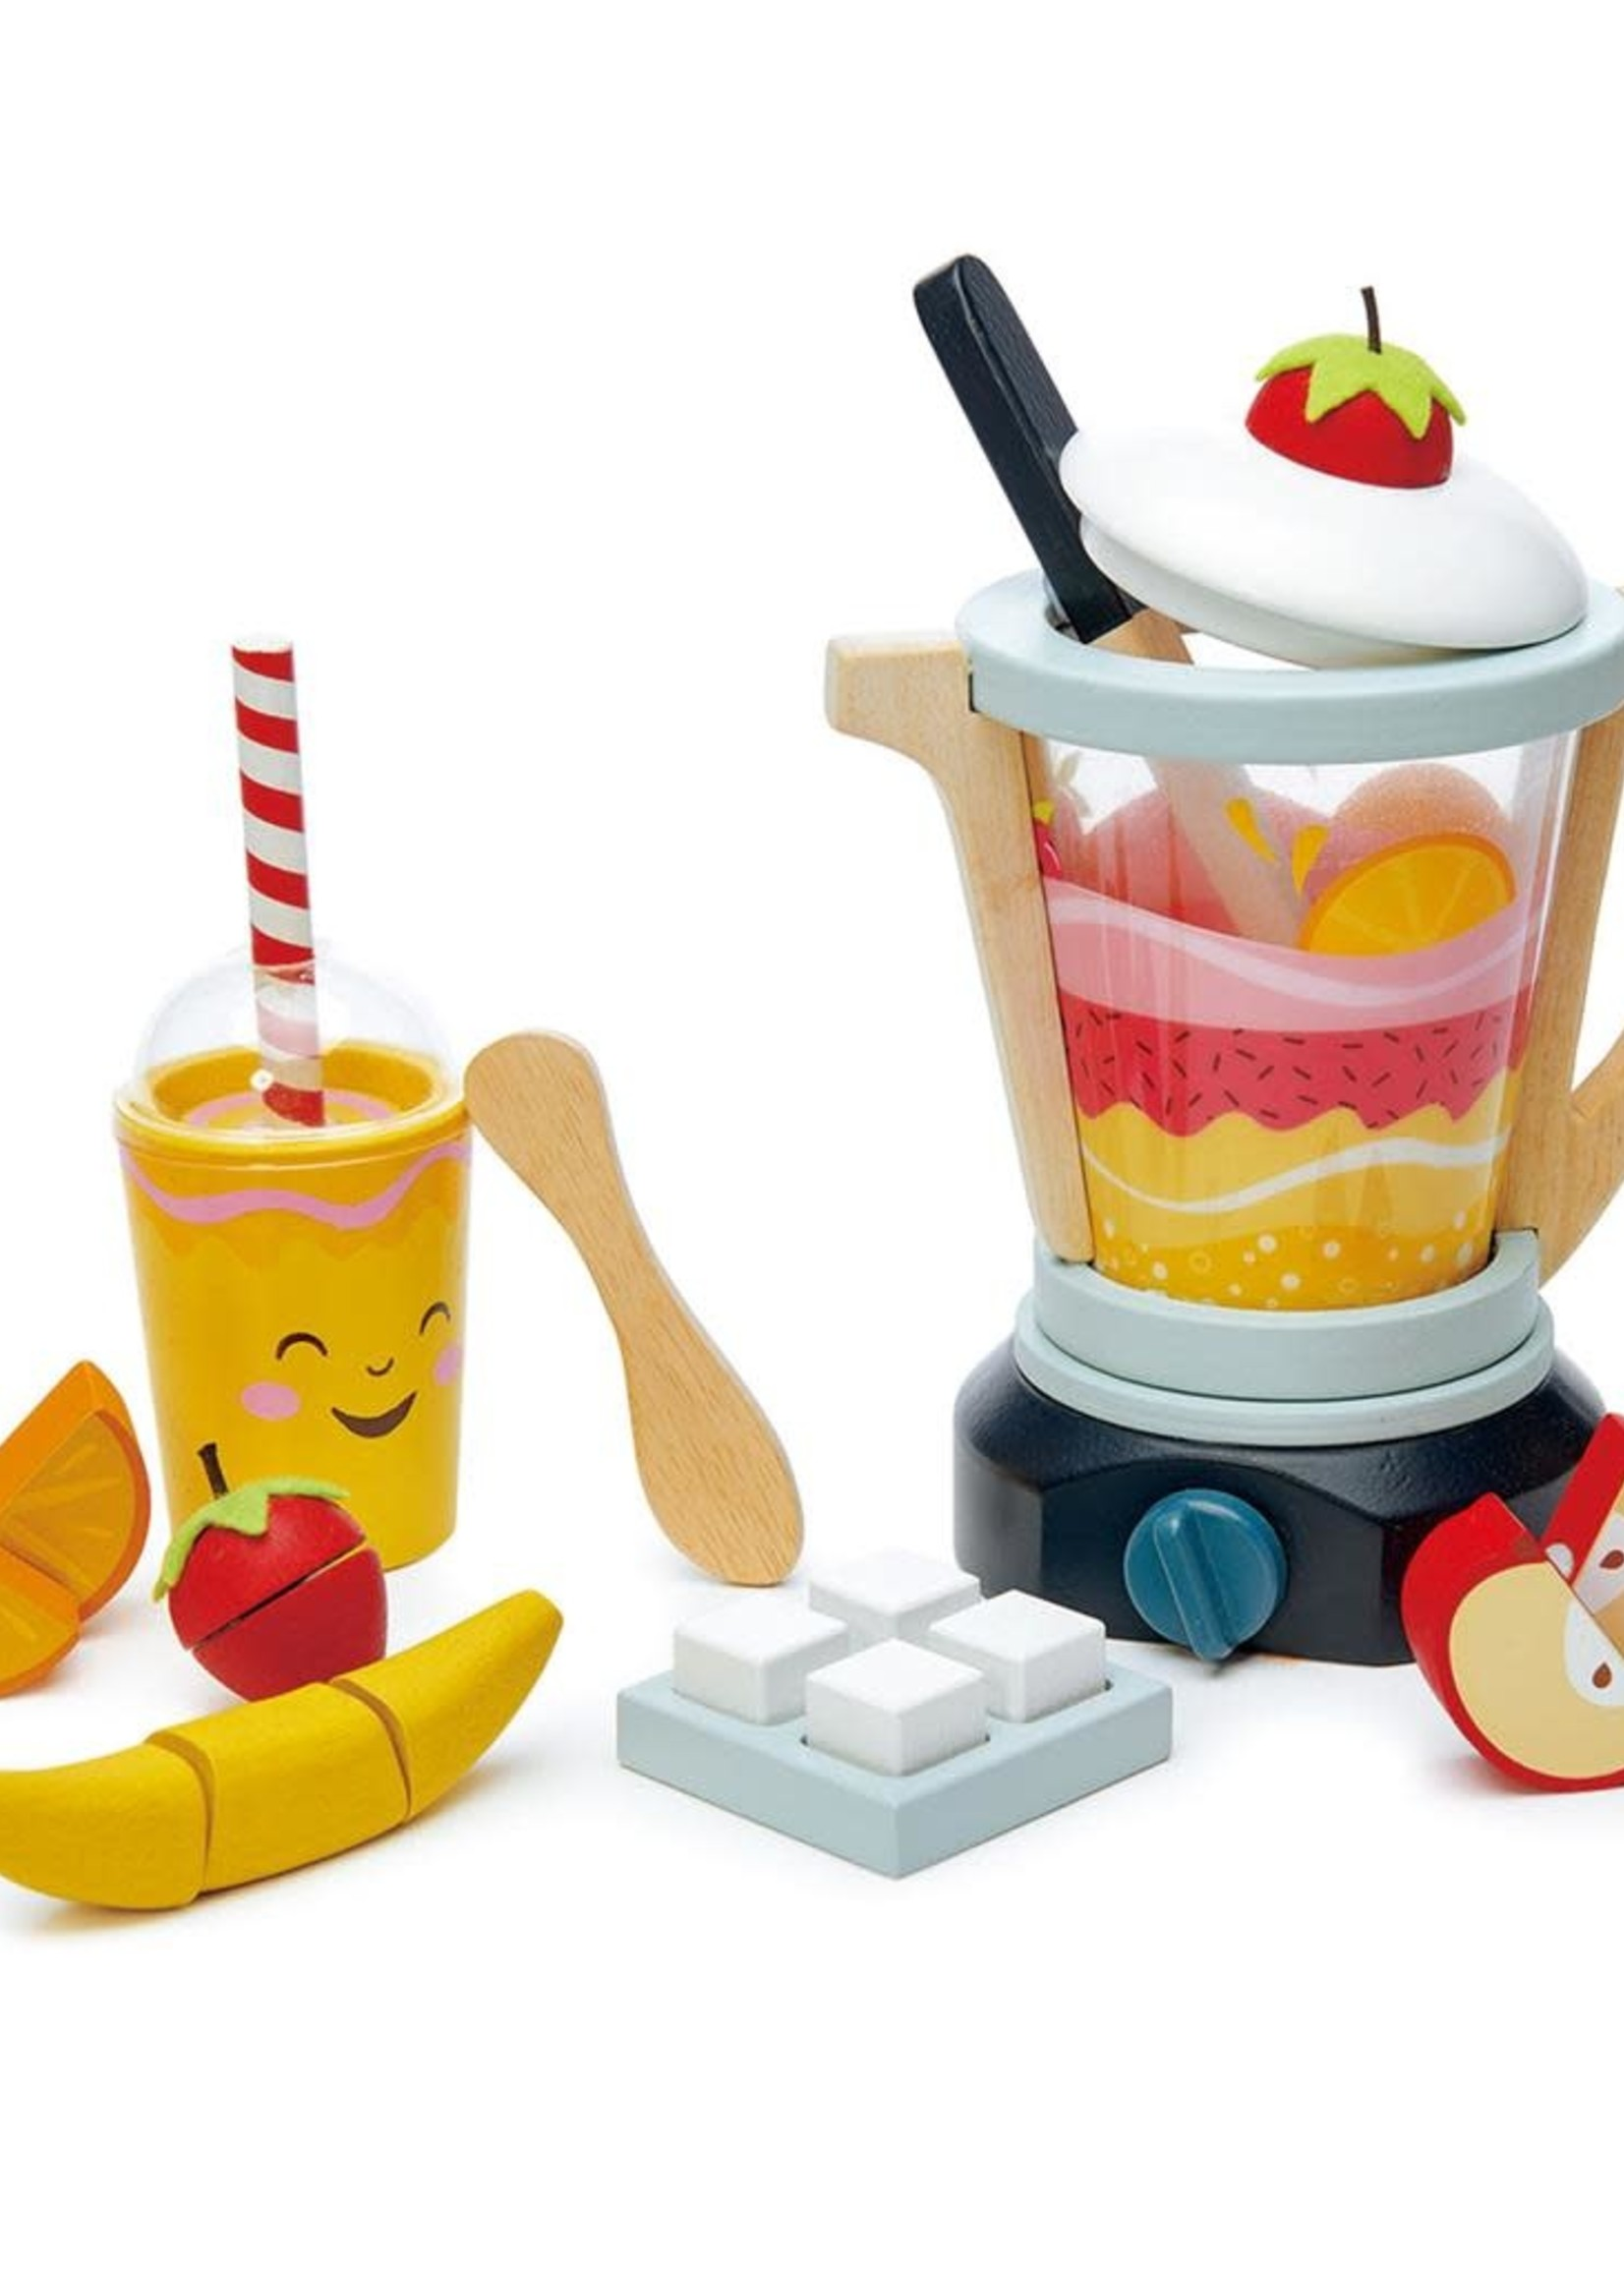 Tender Leaf Toys Blender met fruit